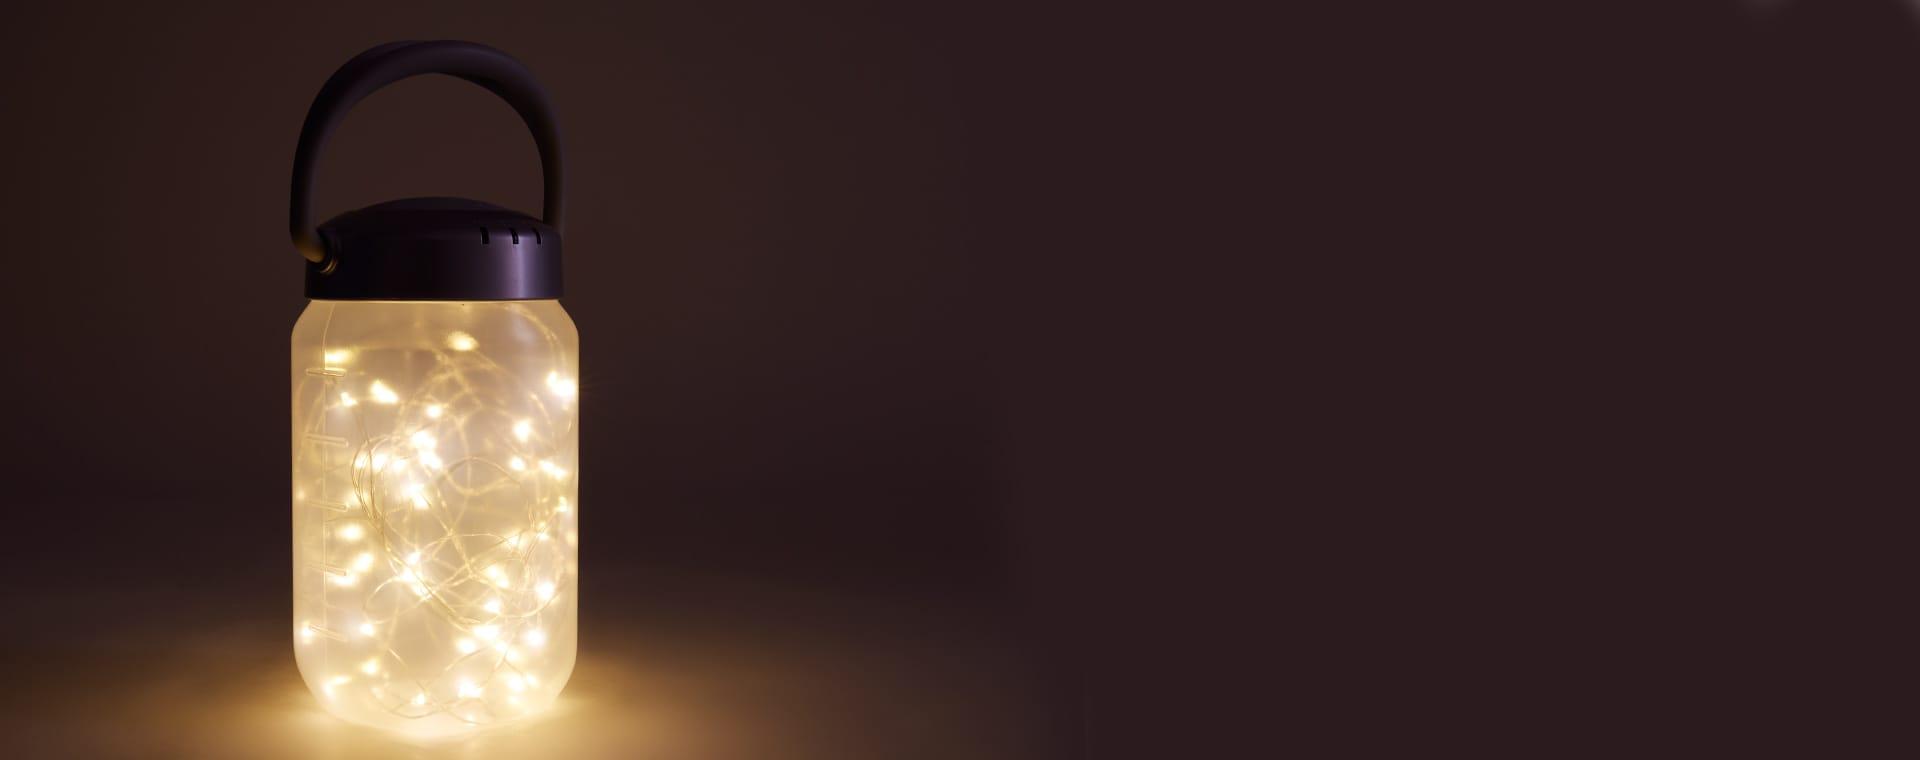 White MyBaby Walkabout Lantern